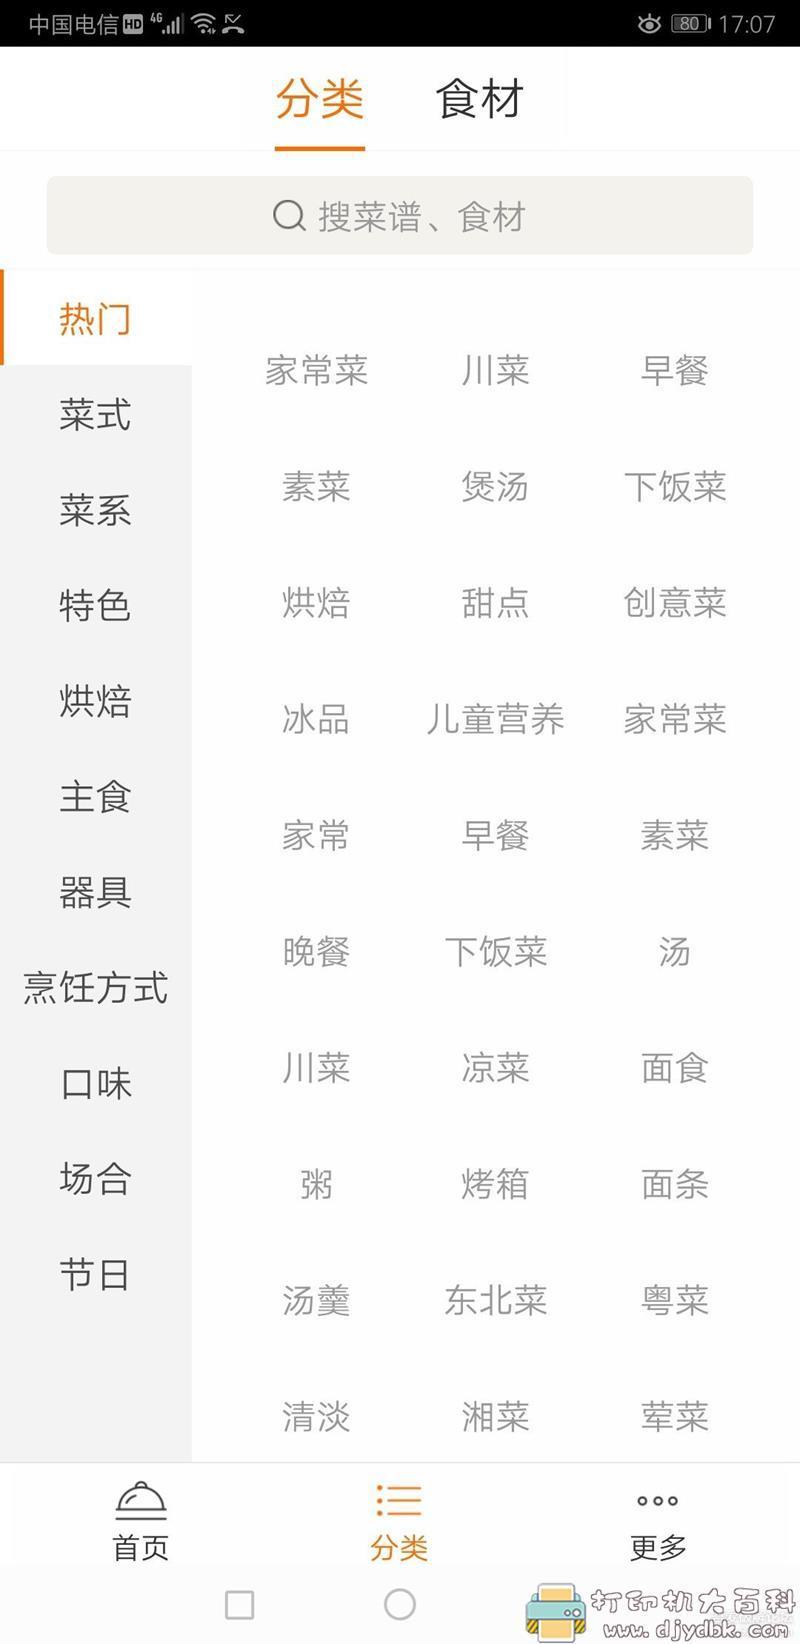 [Android]香哈菜谱6.1.0谷歌市场最新版 配图 No.2